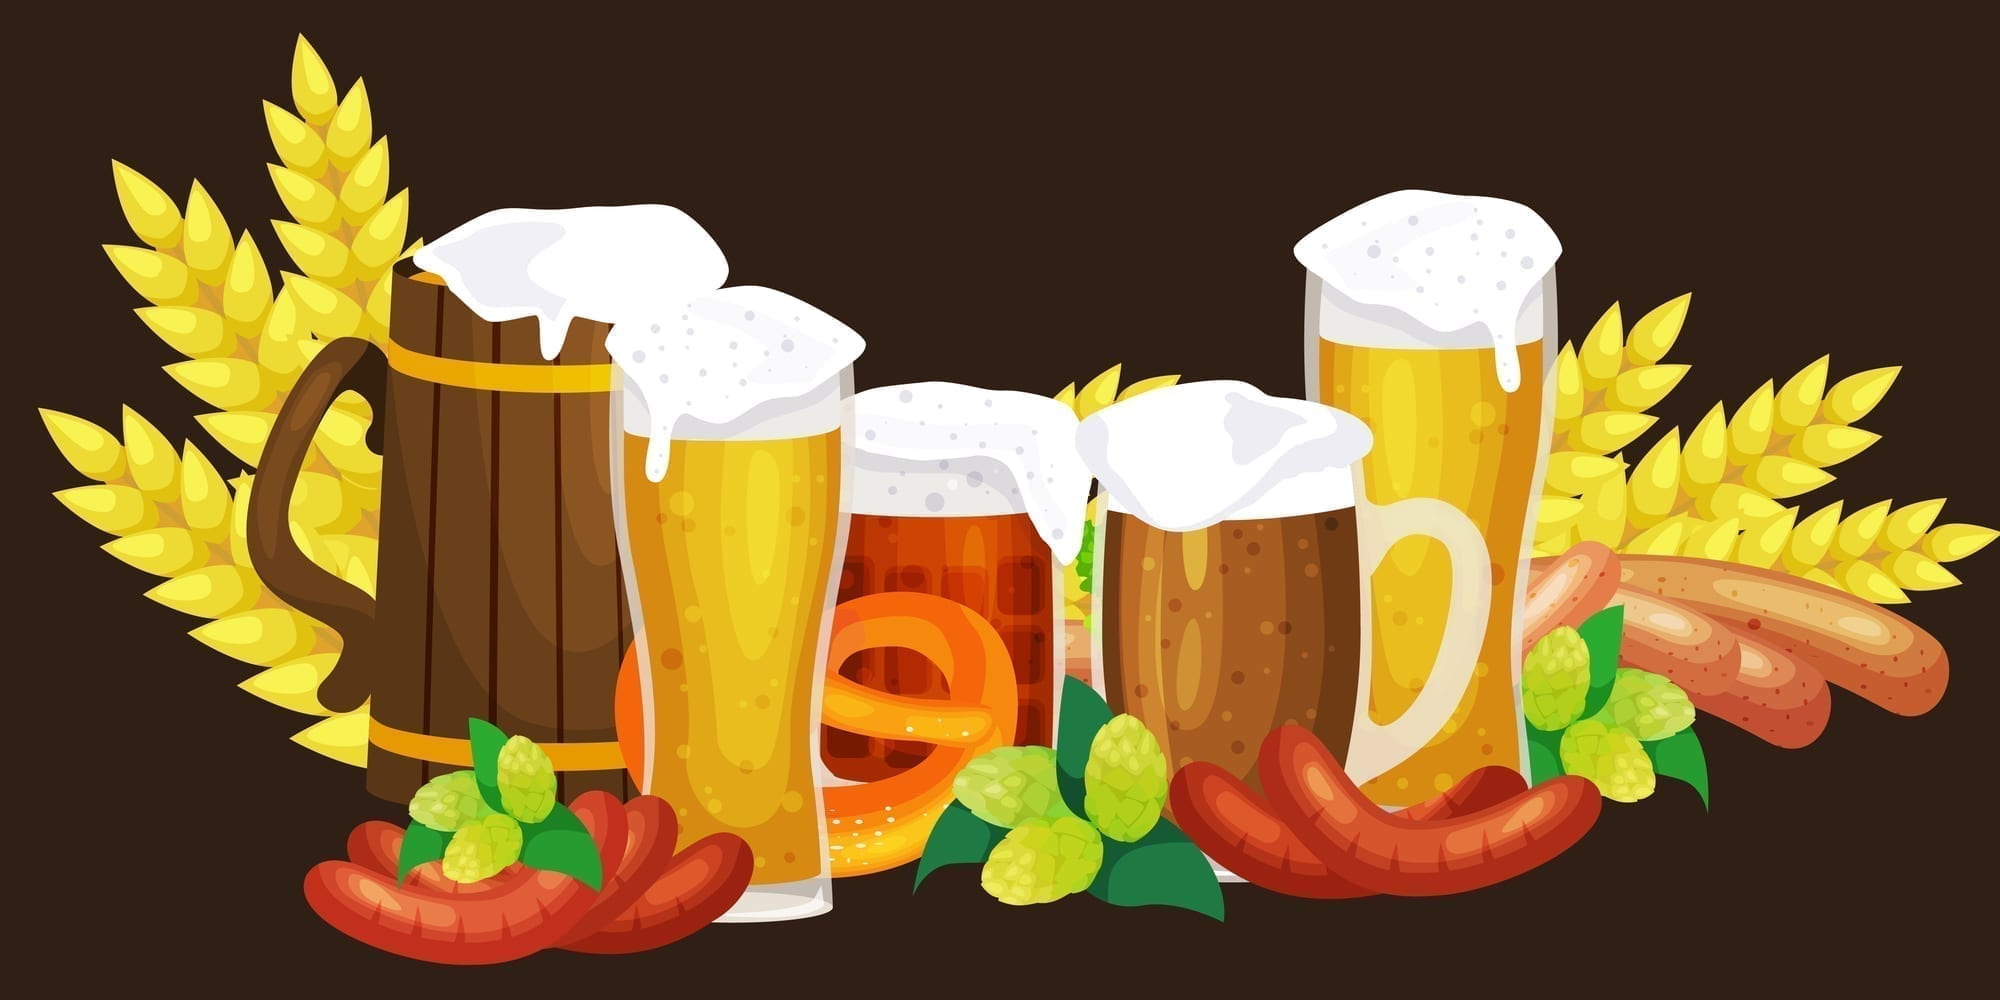 Where to Get a Beer in Munich… Munich Beer Halls, Beer Gardens and Oktoberfest